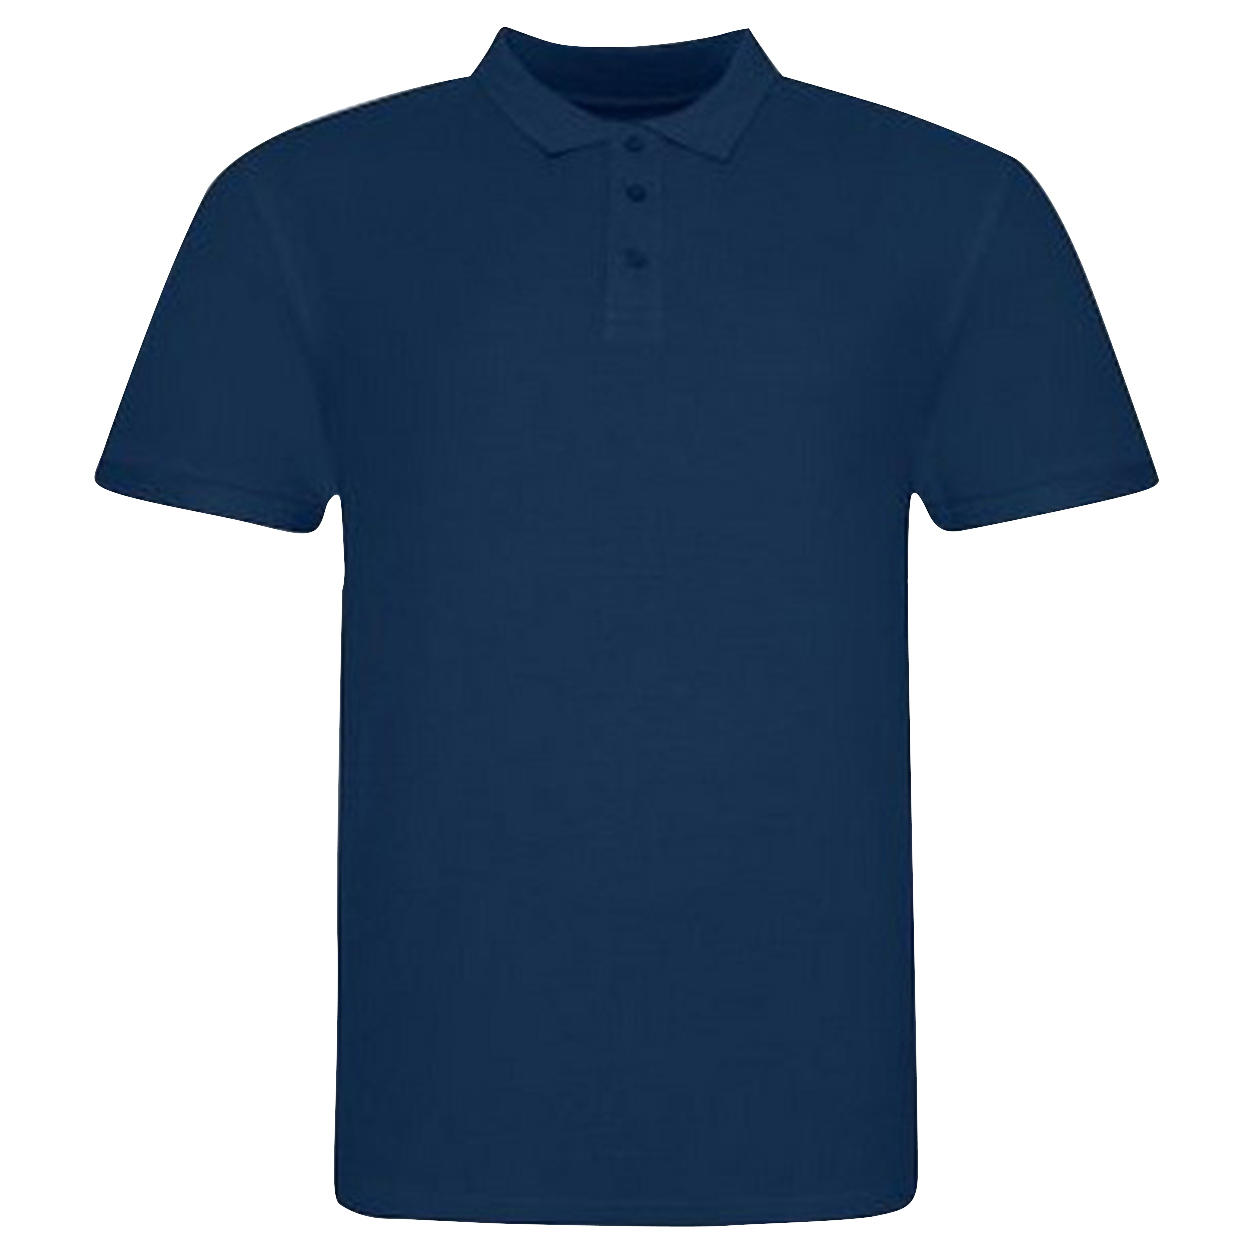 Awdis Mens Piqu Cotton Short-Sleeved Polo Shirt (M) (Ink)